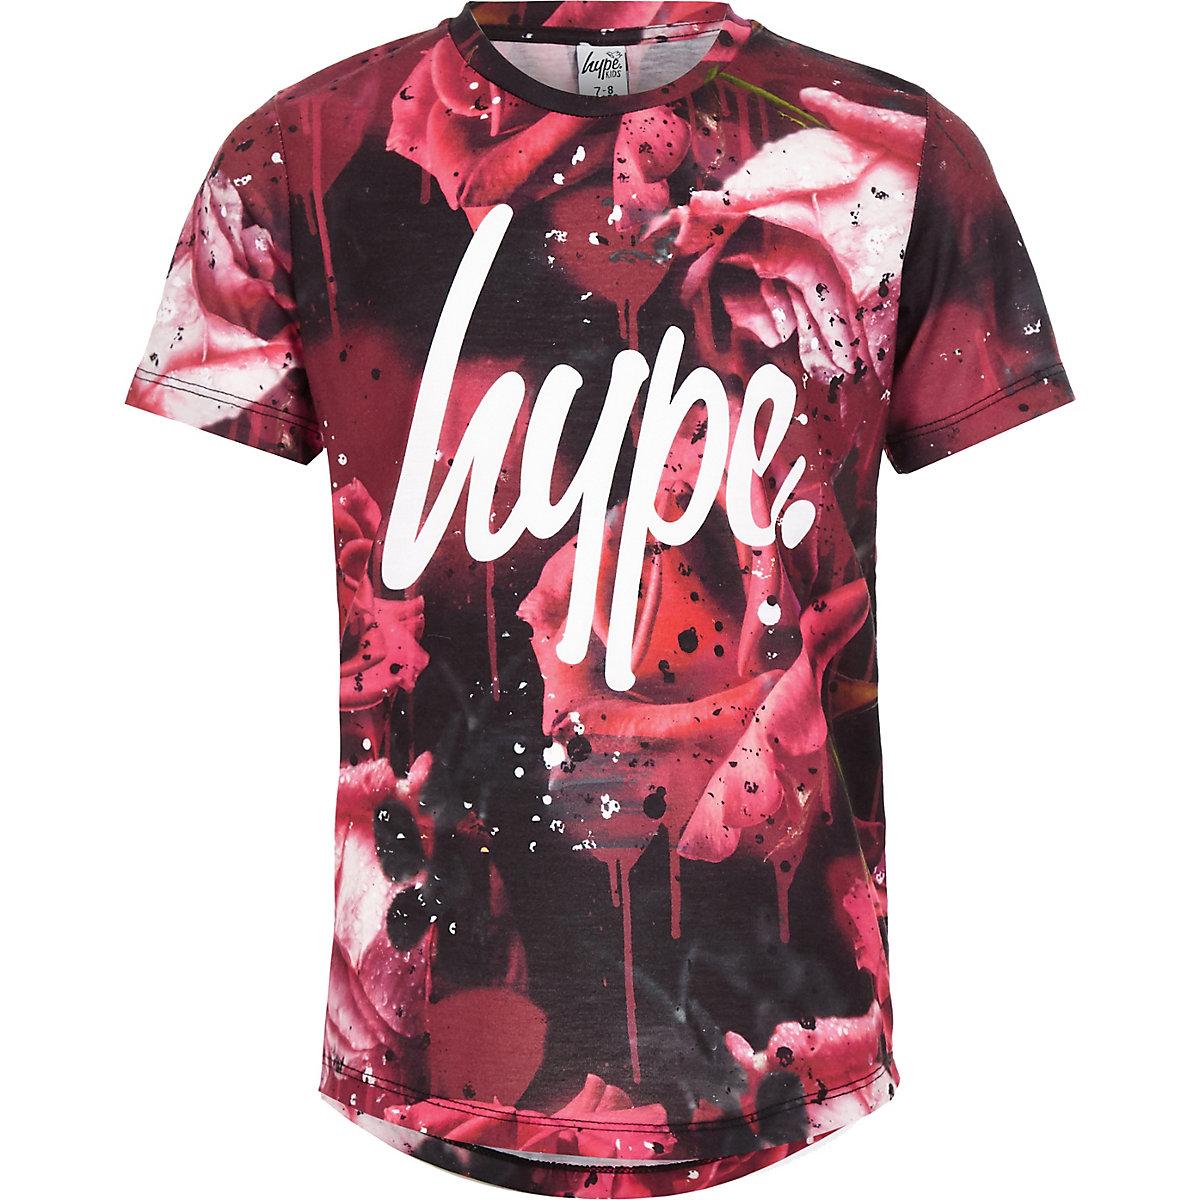 Boys Hype red rose splat T-shirt